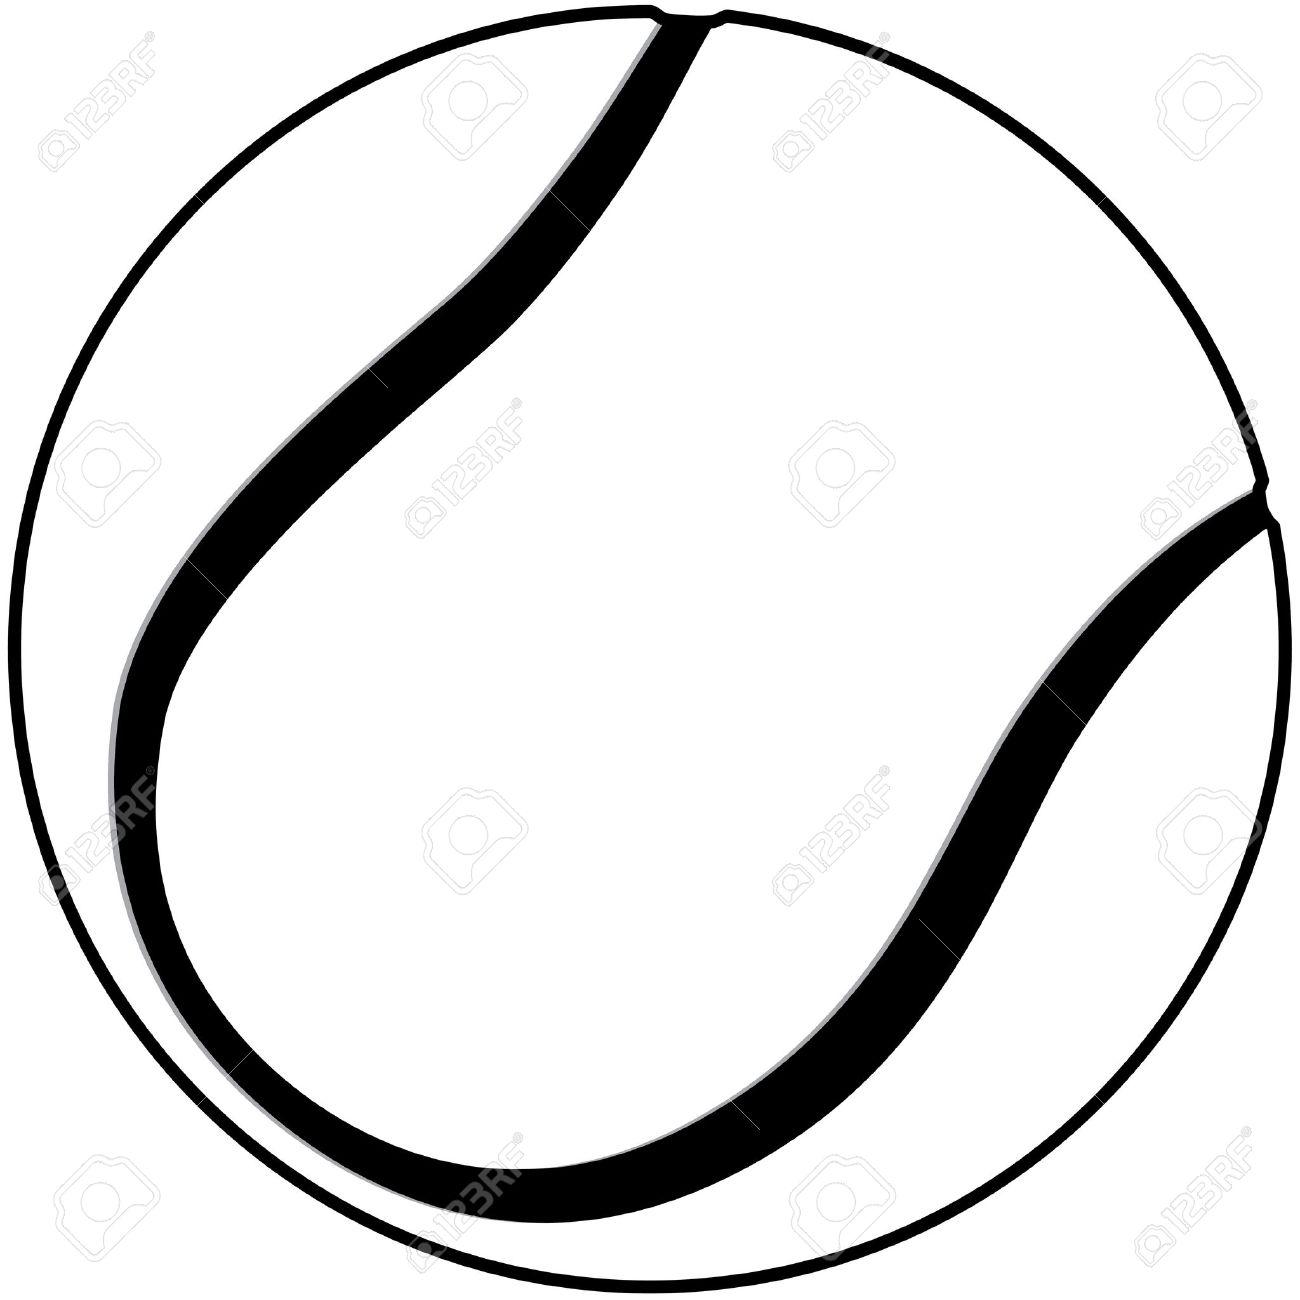 Tennis Ball Black And White